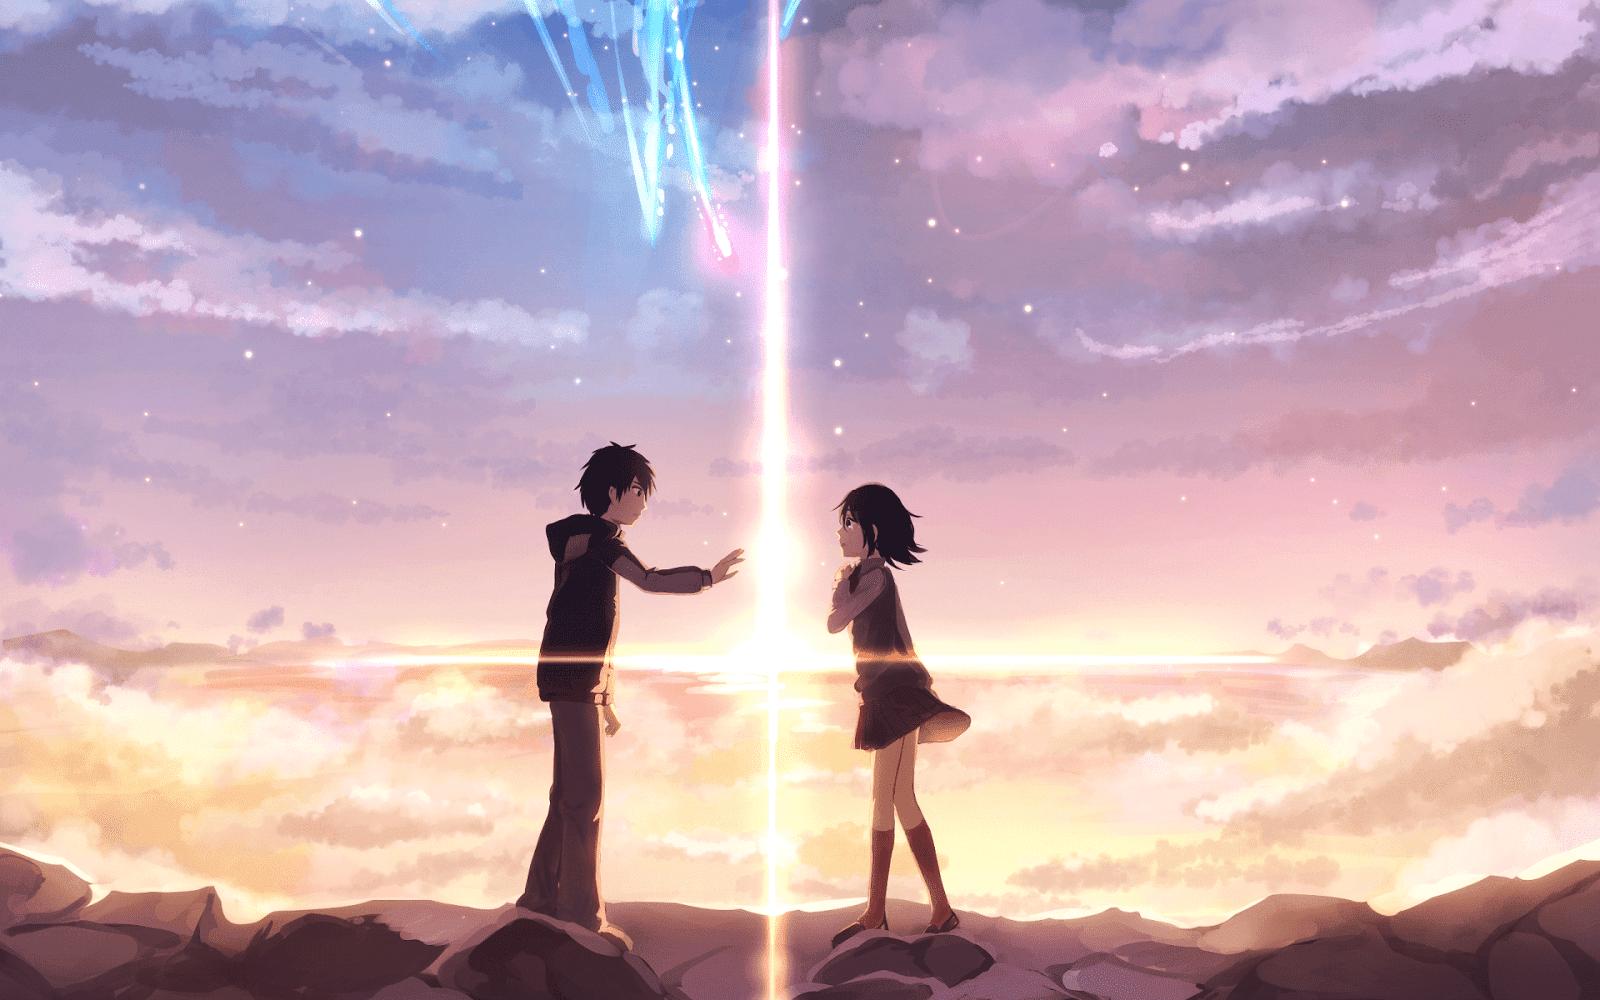 [ Hình Nền ] Anime Your Name. Kimi no Nawa full HD cực